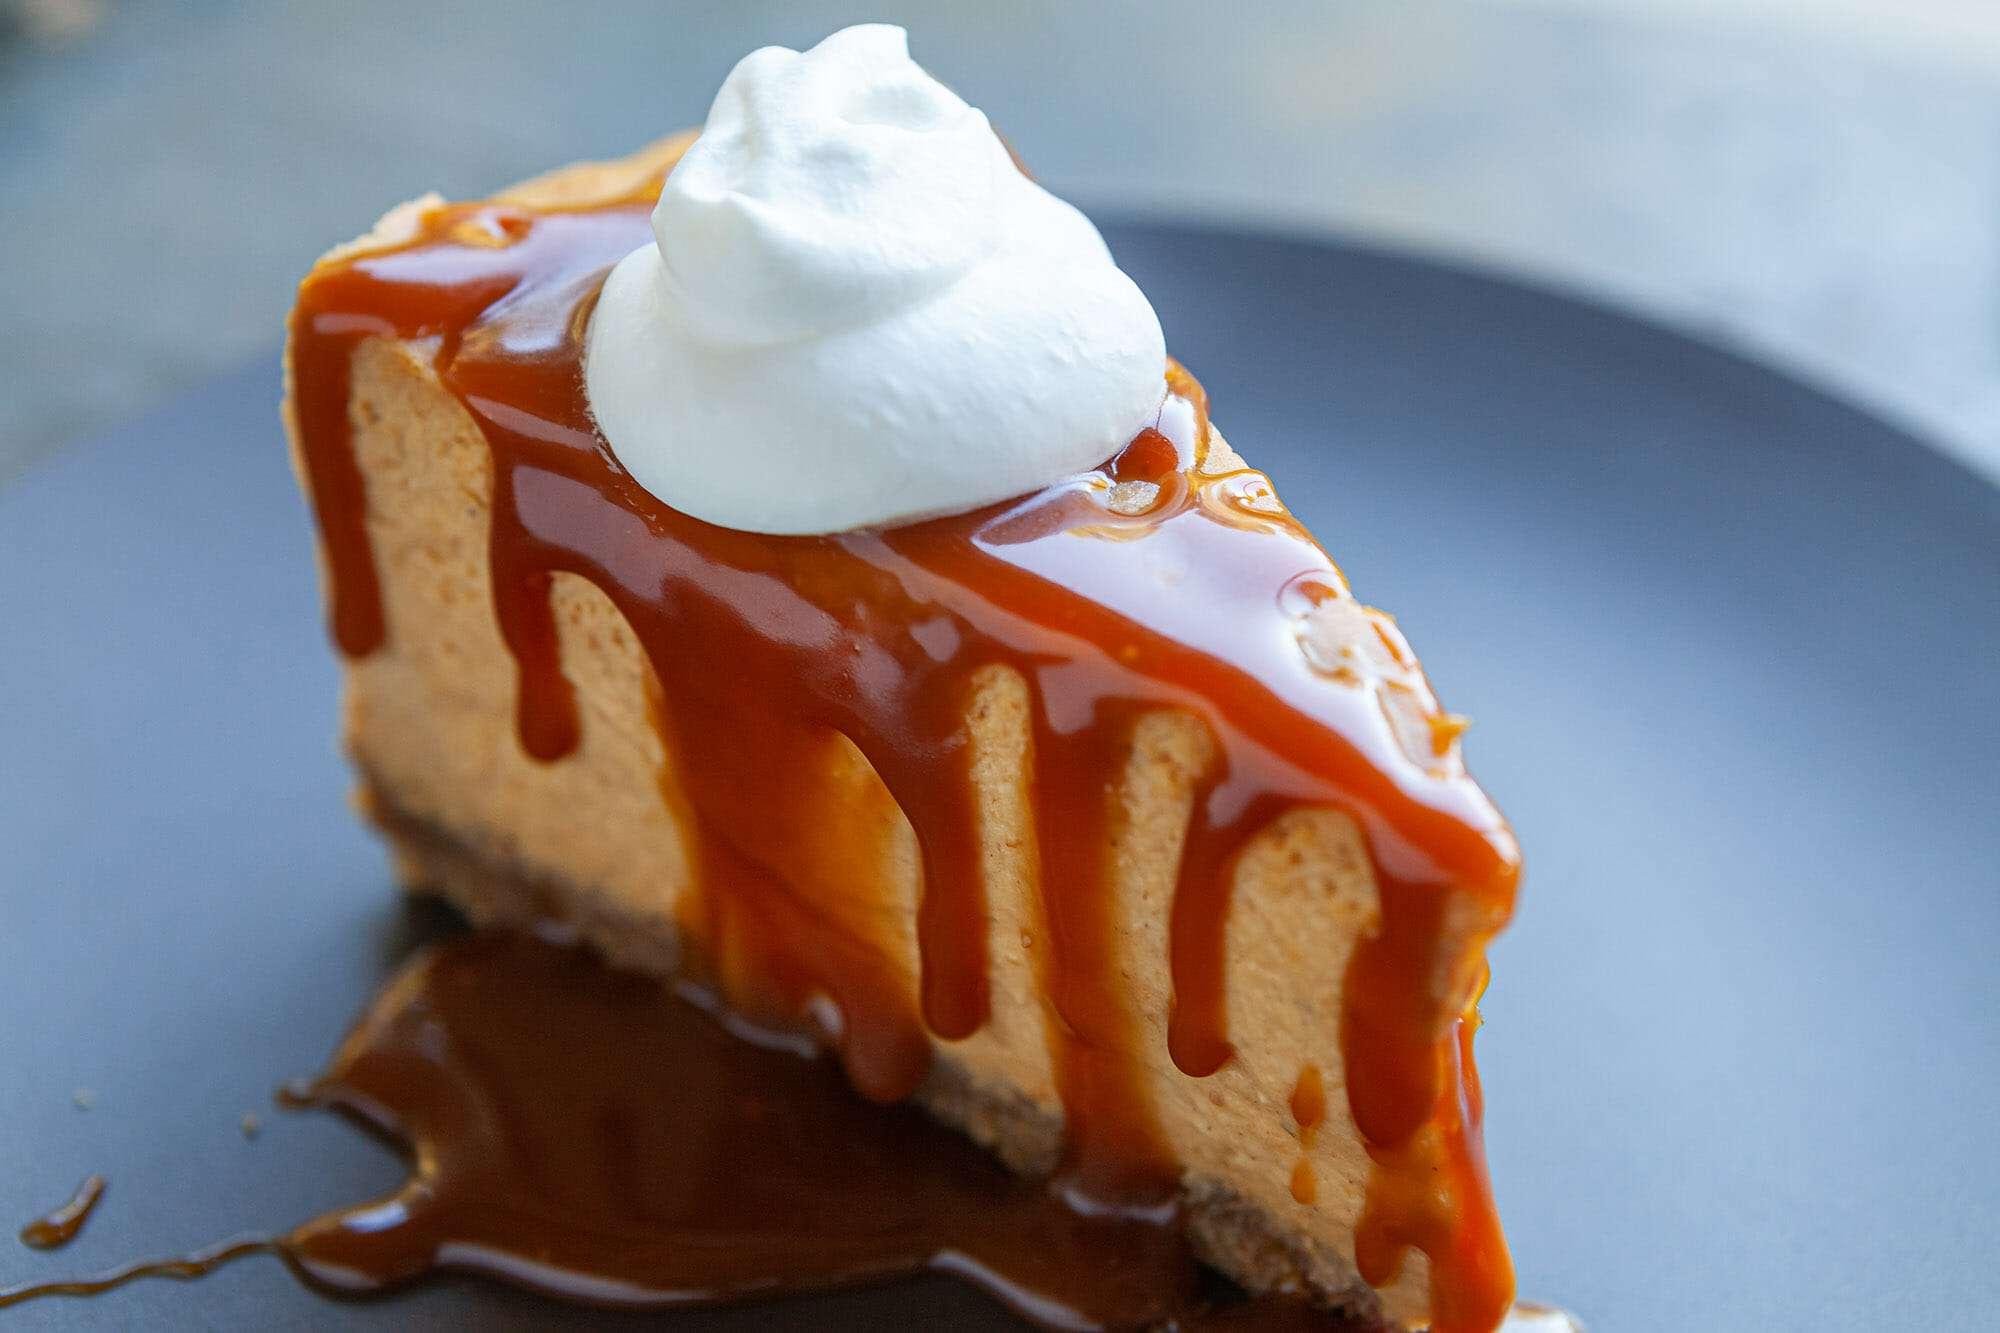 pumpkin cheesecake slice with whipped cream